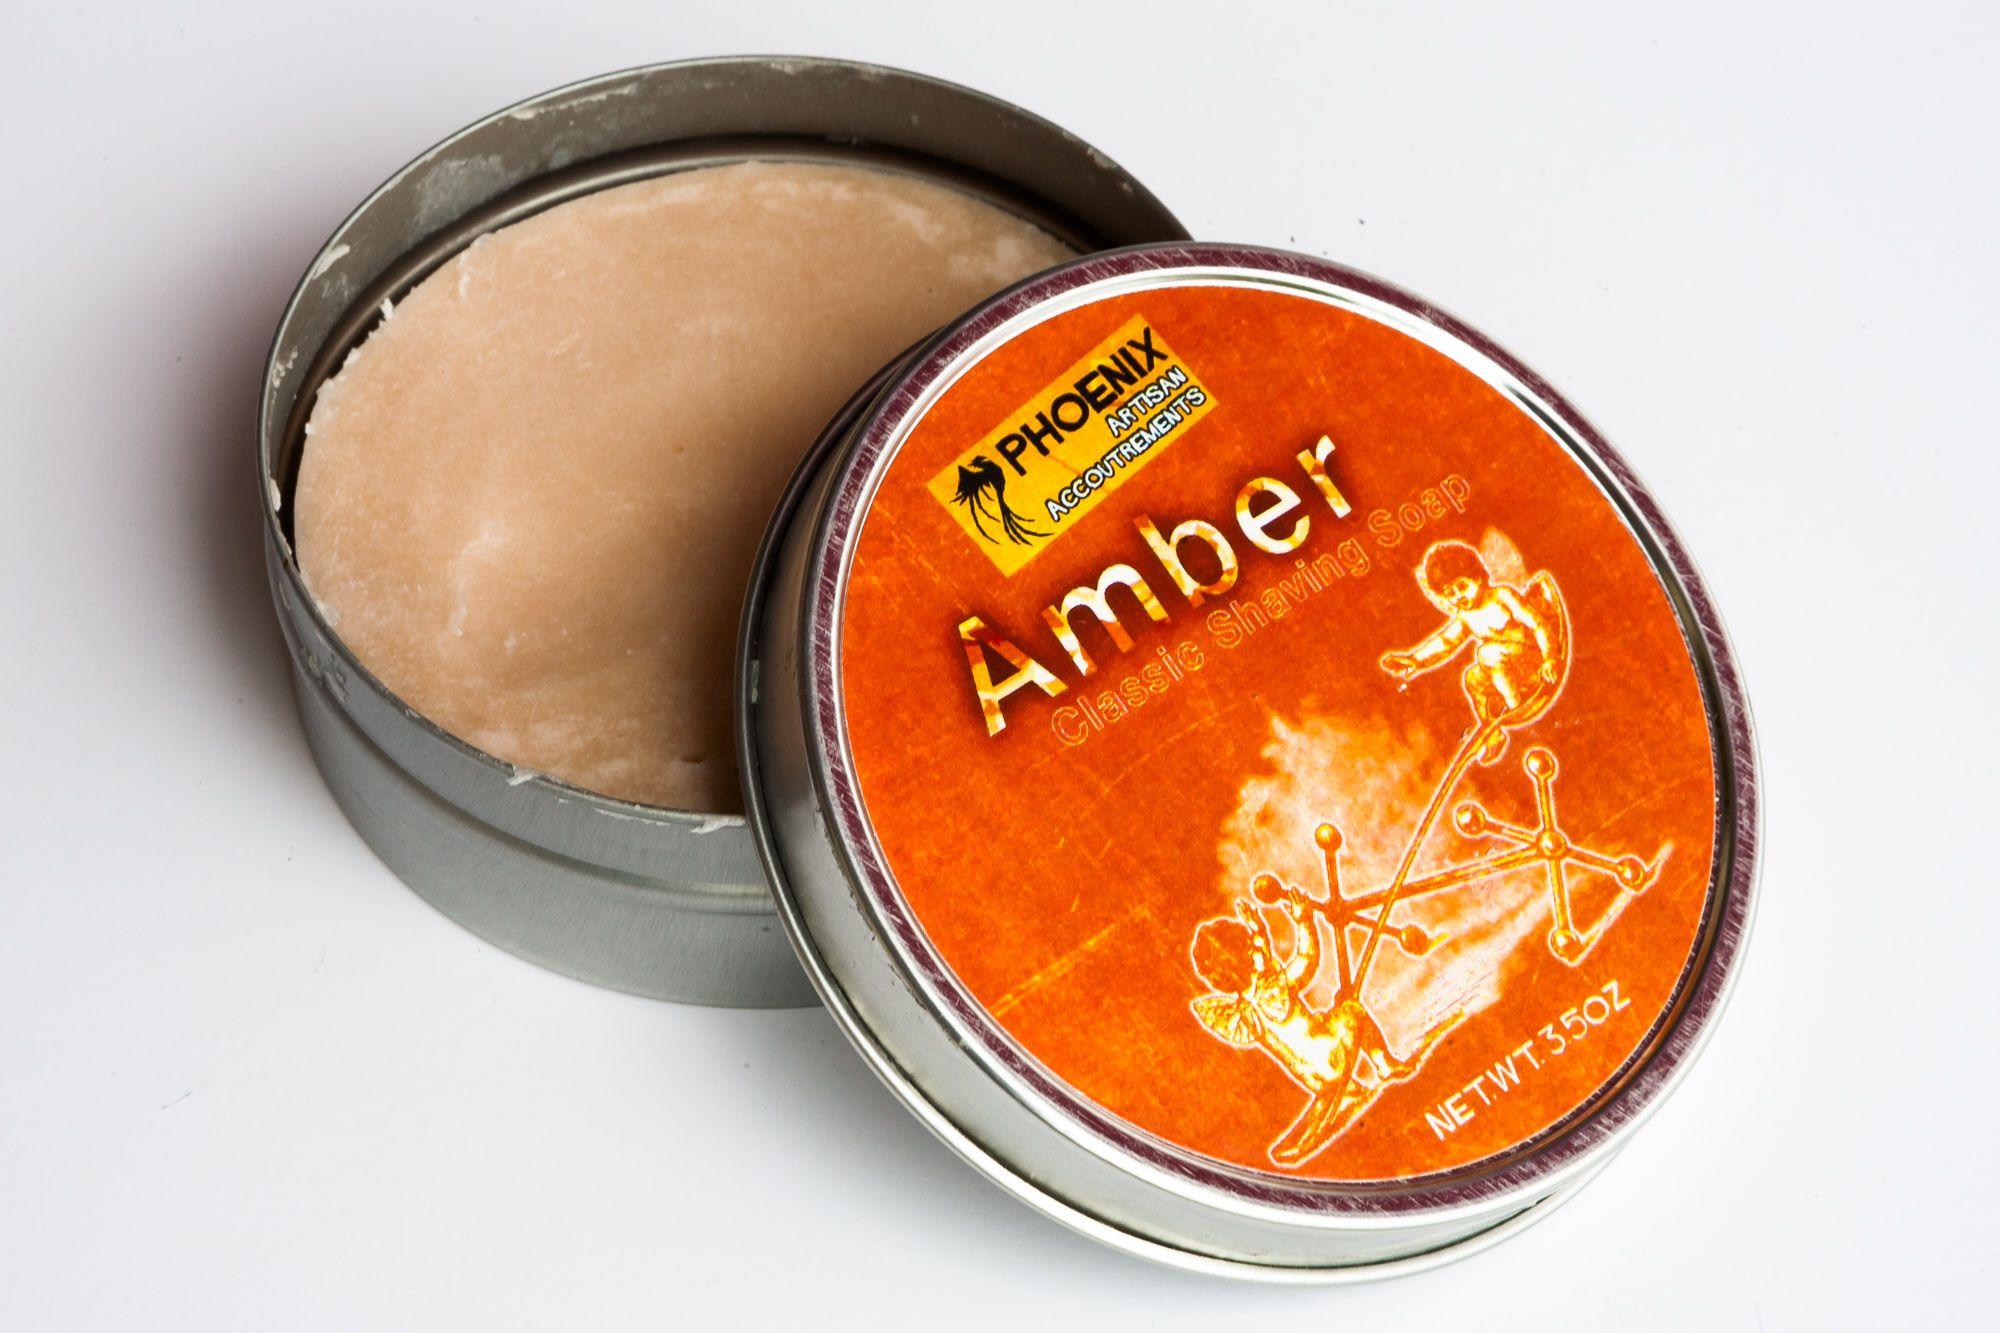 Konsystencja mydła do golenia Phoenix Artisan Accoutrements Amber Shaving Soap